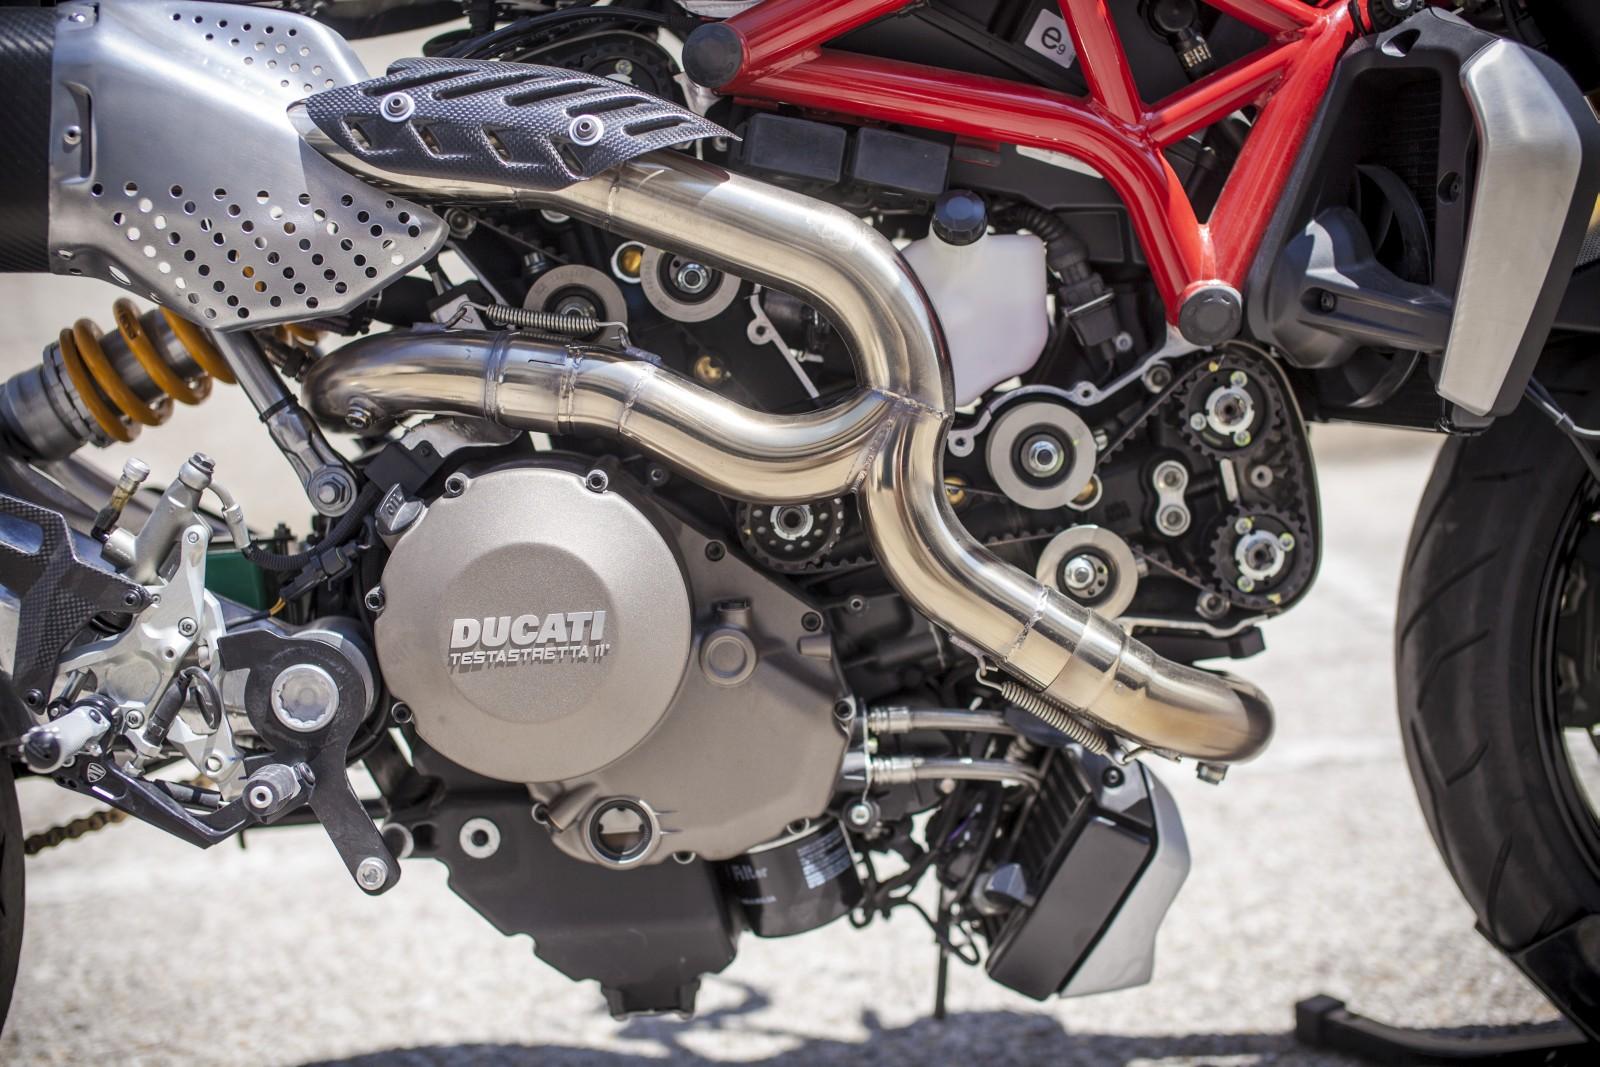 Customised Ducati Monster 1200 - XTR Pepo Siluro (12)